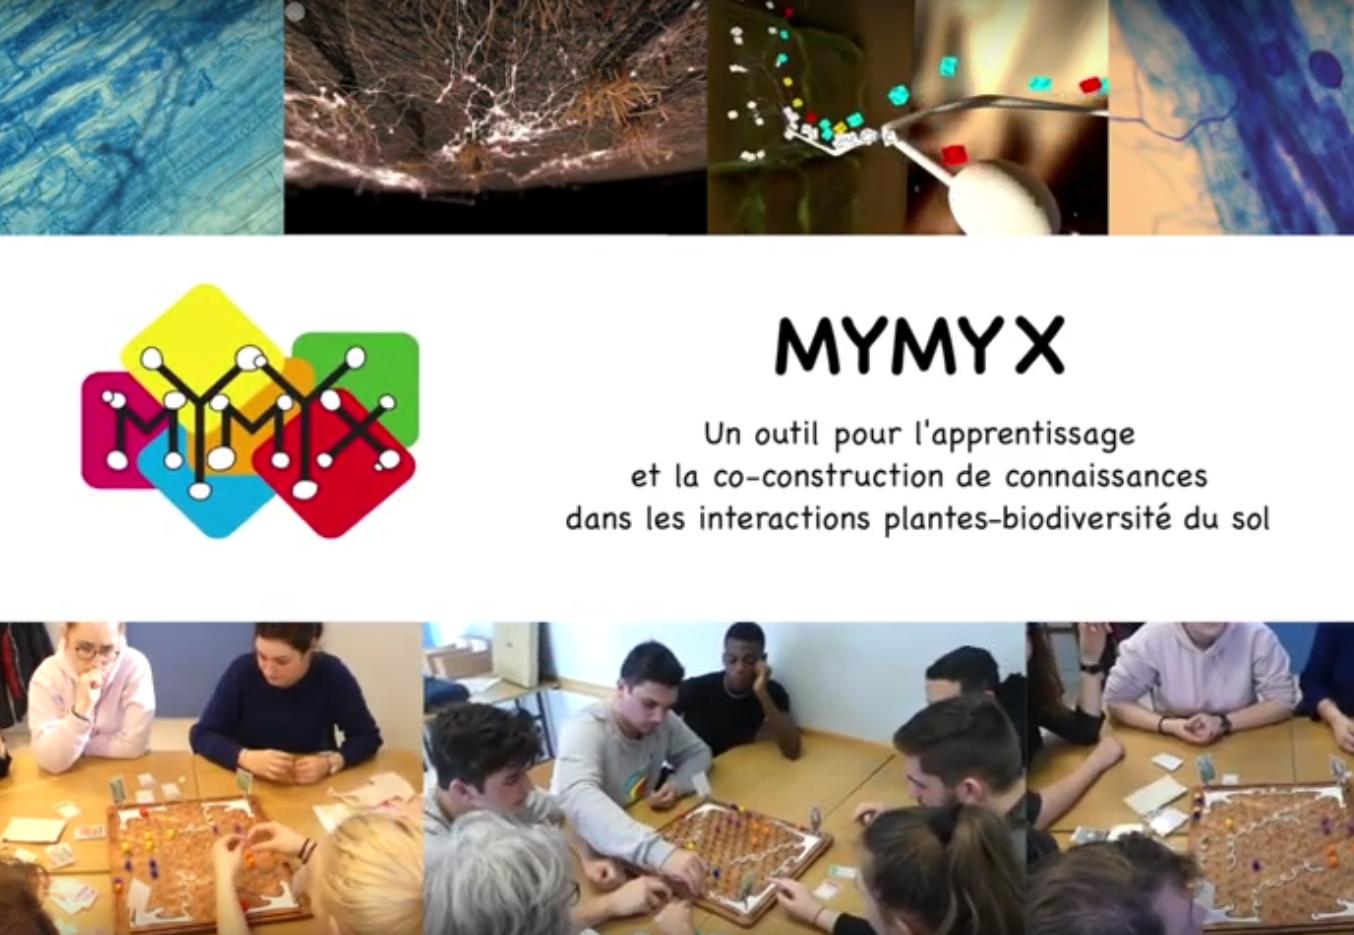 MYMYX